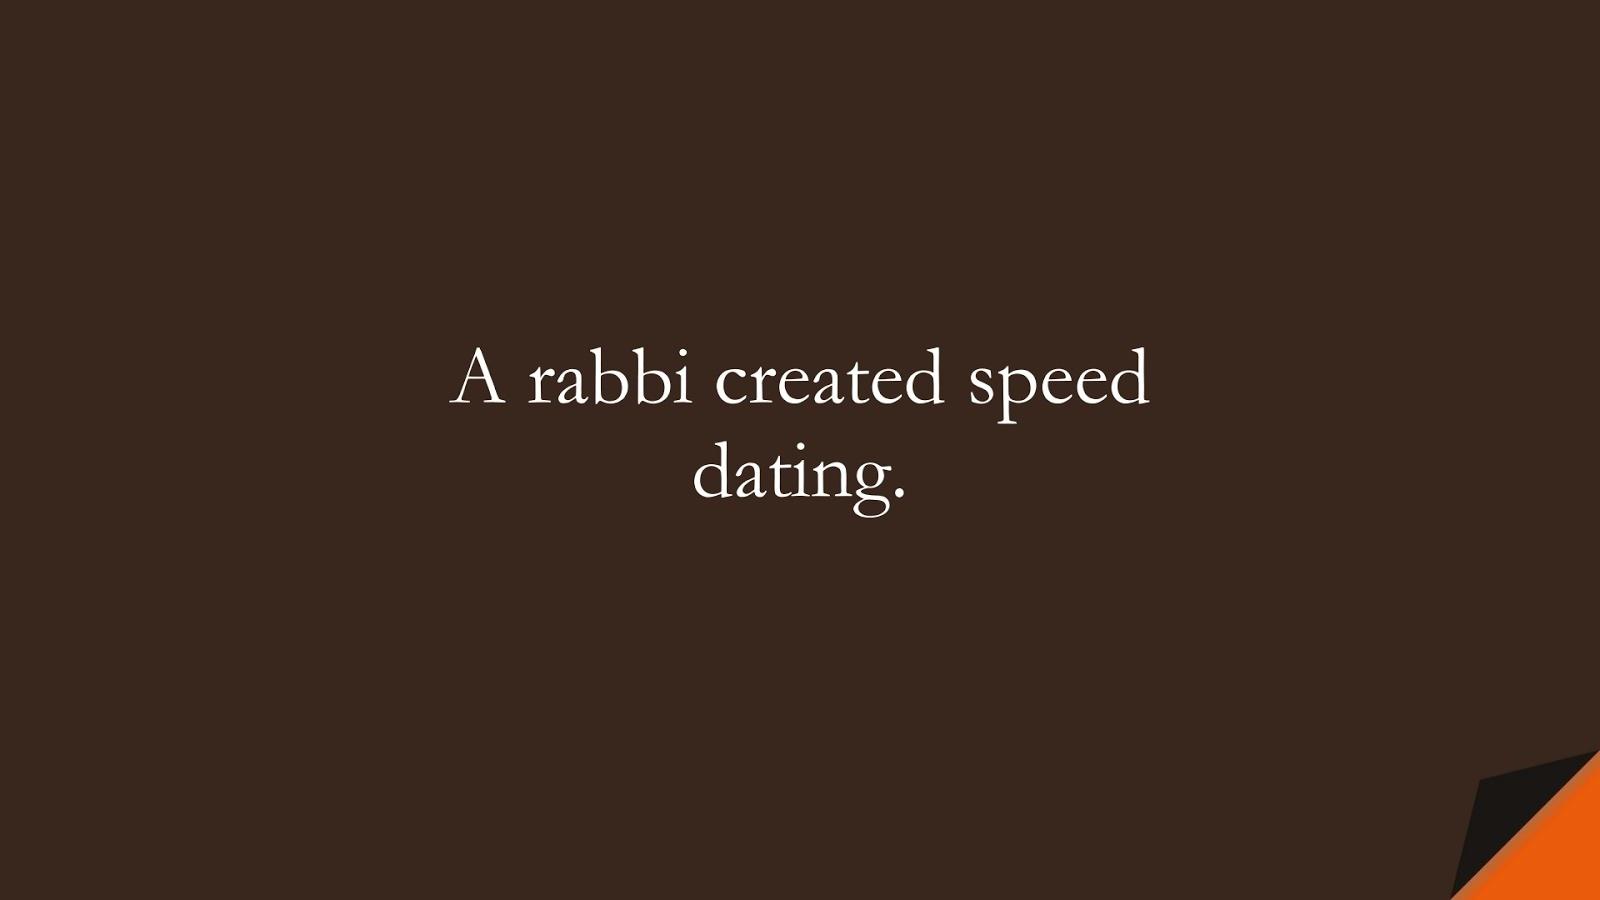 A rabbi created speed dating.FALSE